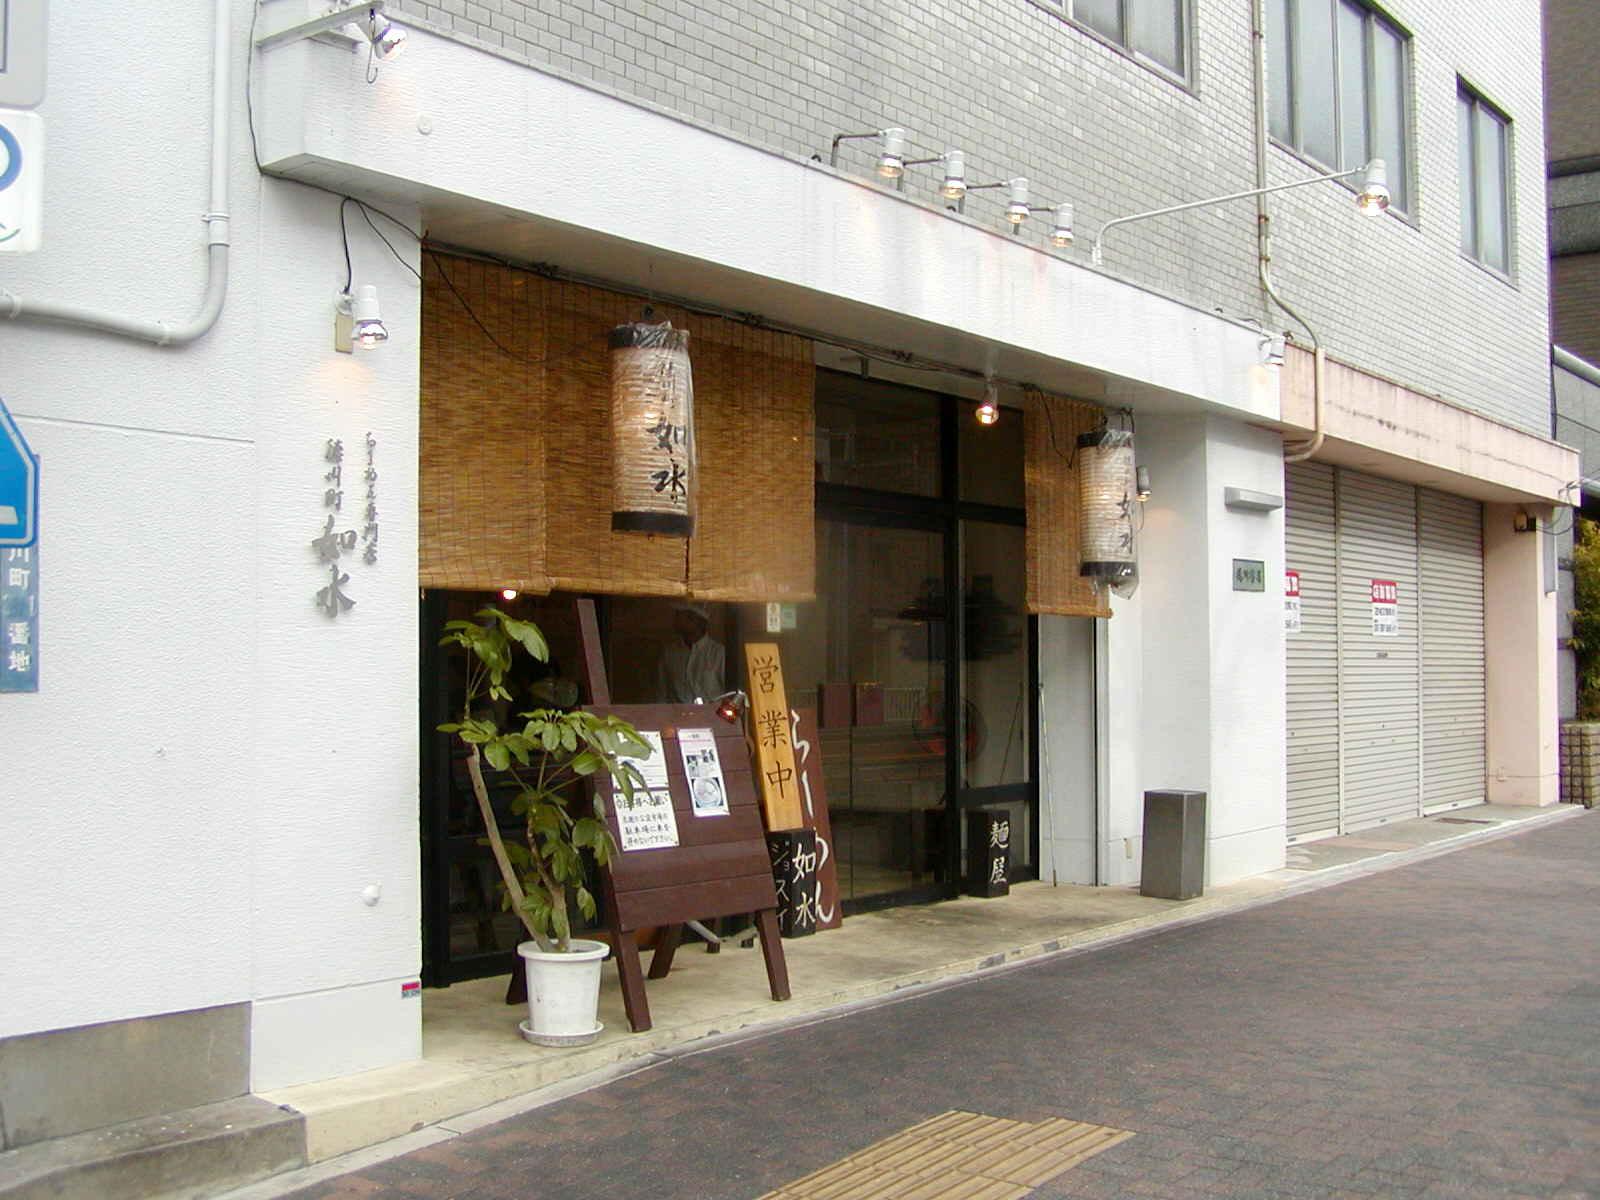 麺屋 如水【かけ・塩】 @愛知県名古屋市